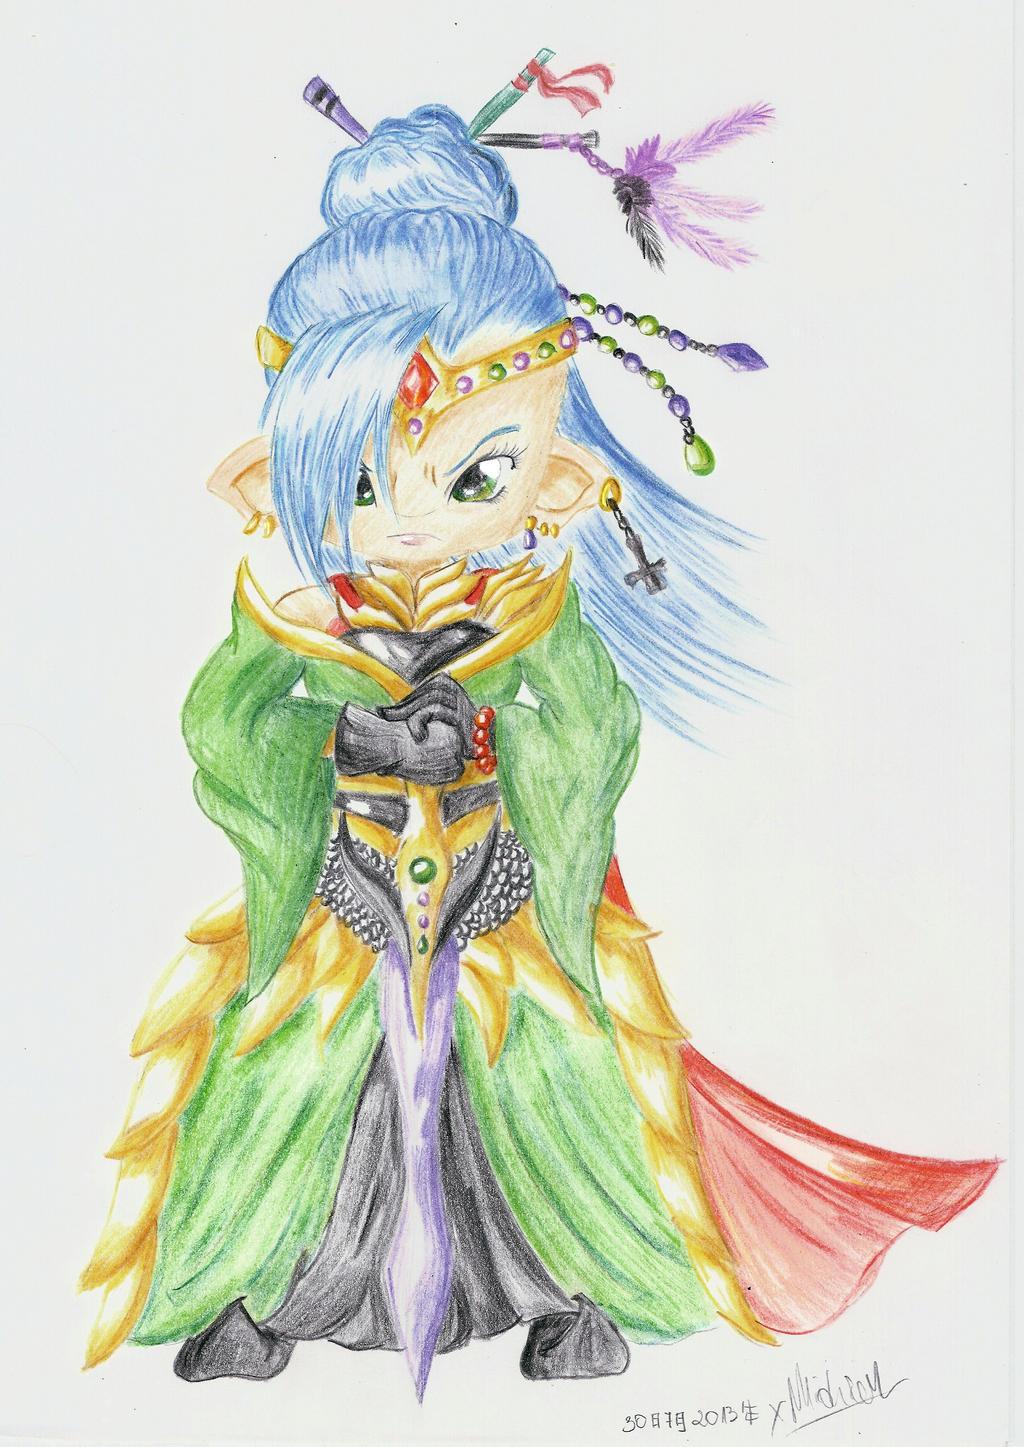 Midd - Empress of Tyconteroga Version 3 by xMidziak